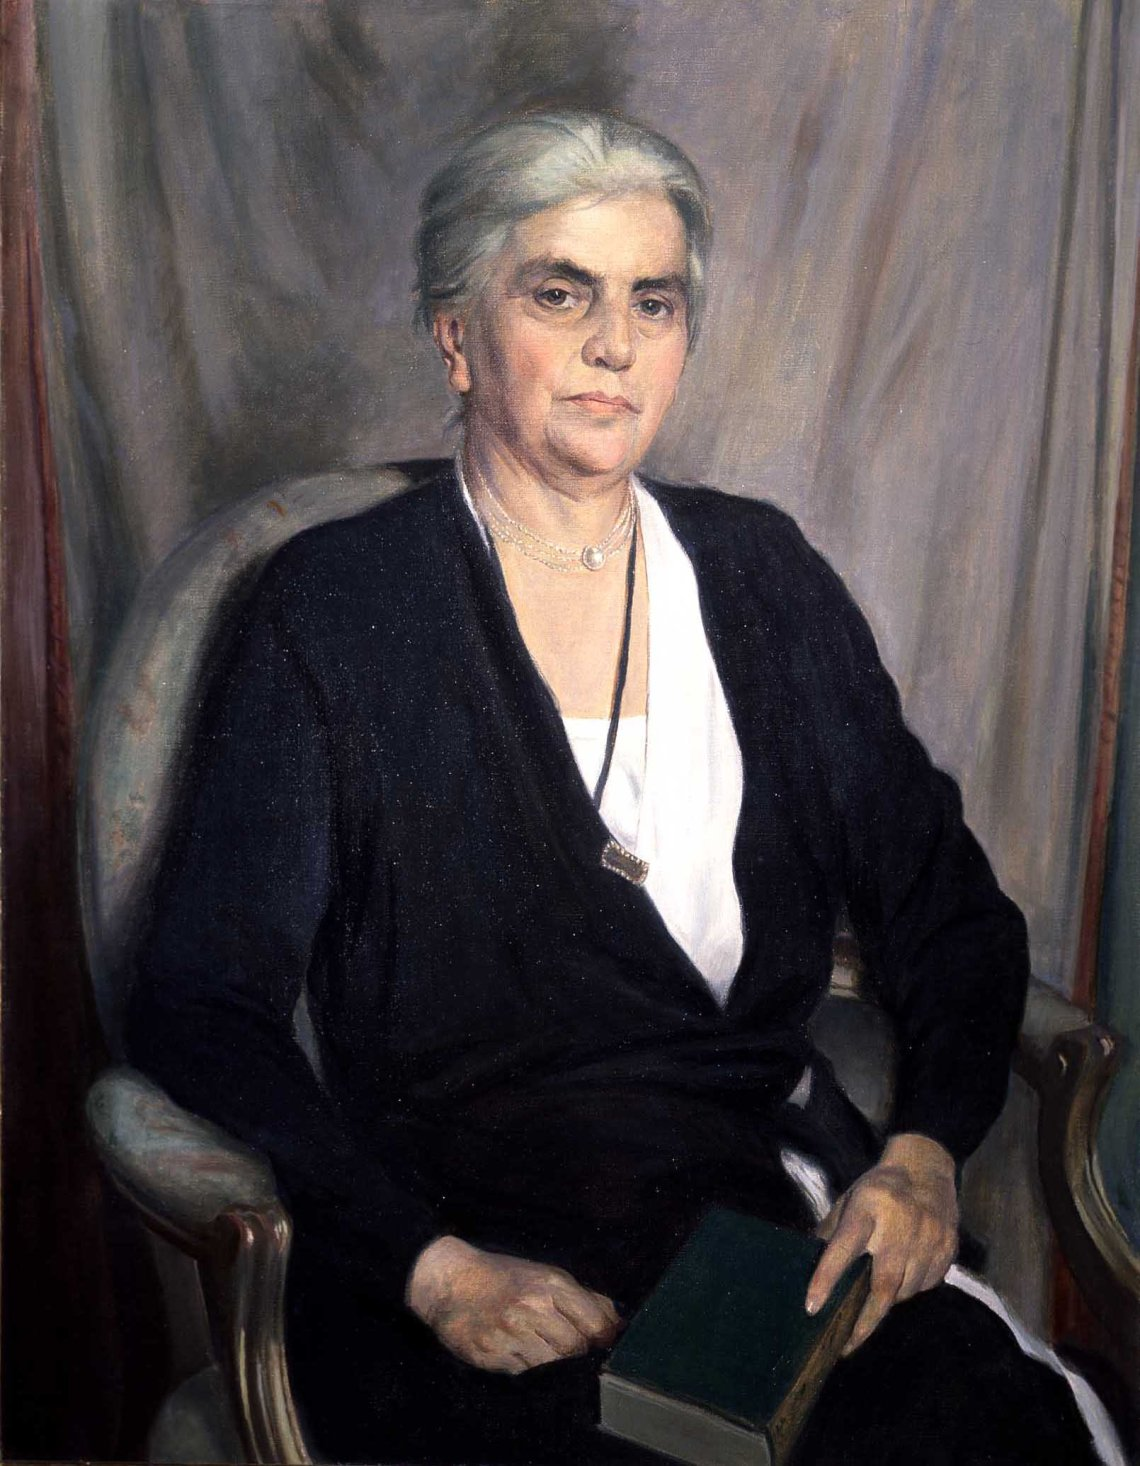 Eleanor Rathbone Parliamentary Art Collection WOA 4391)